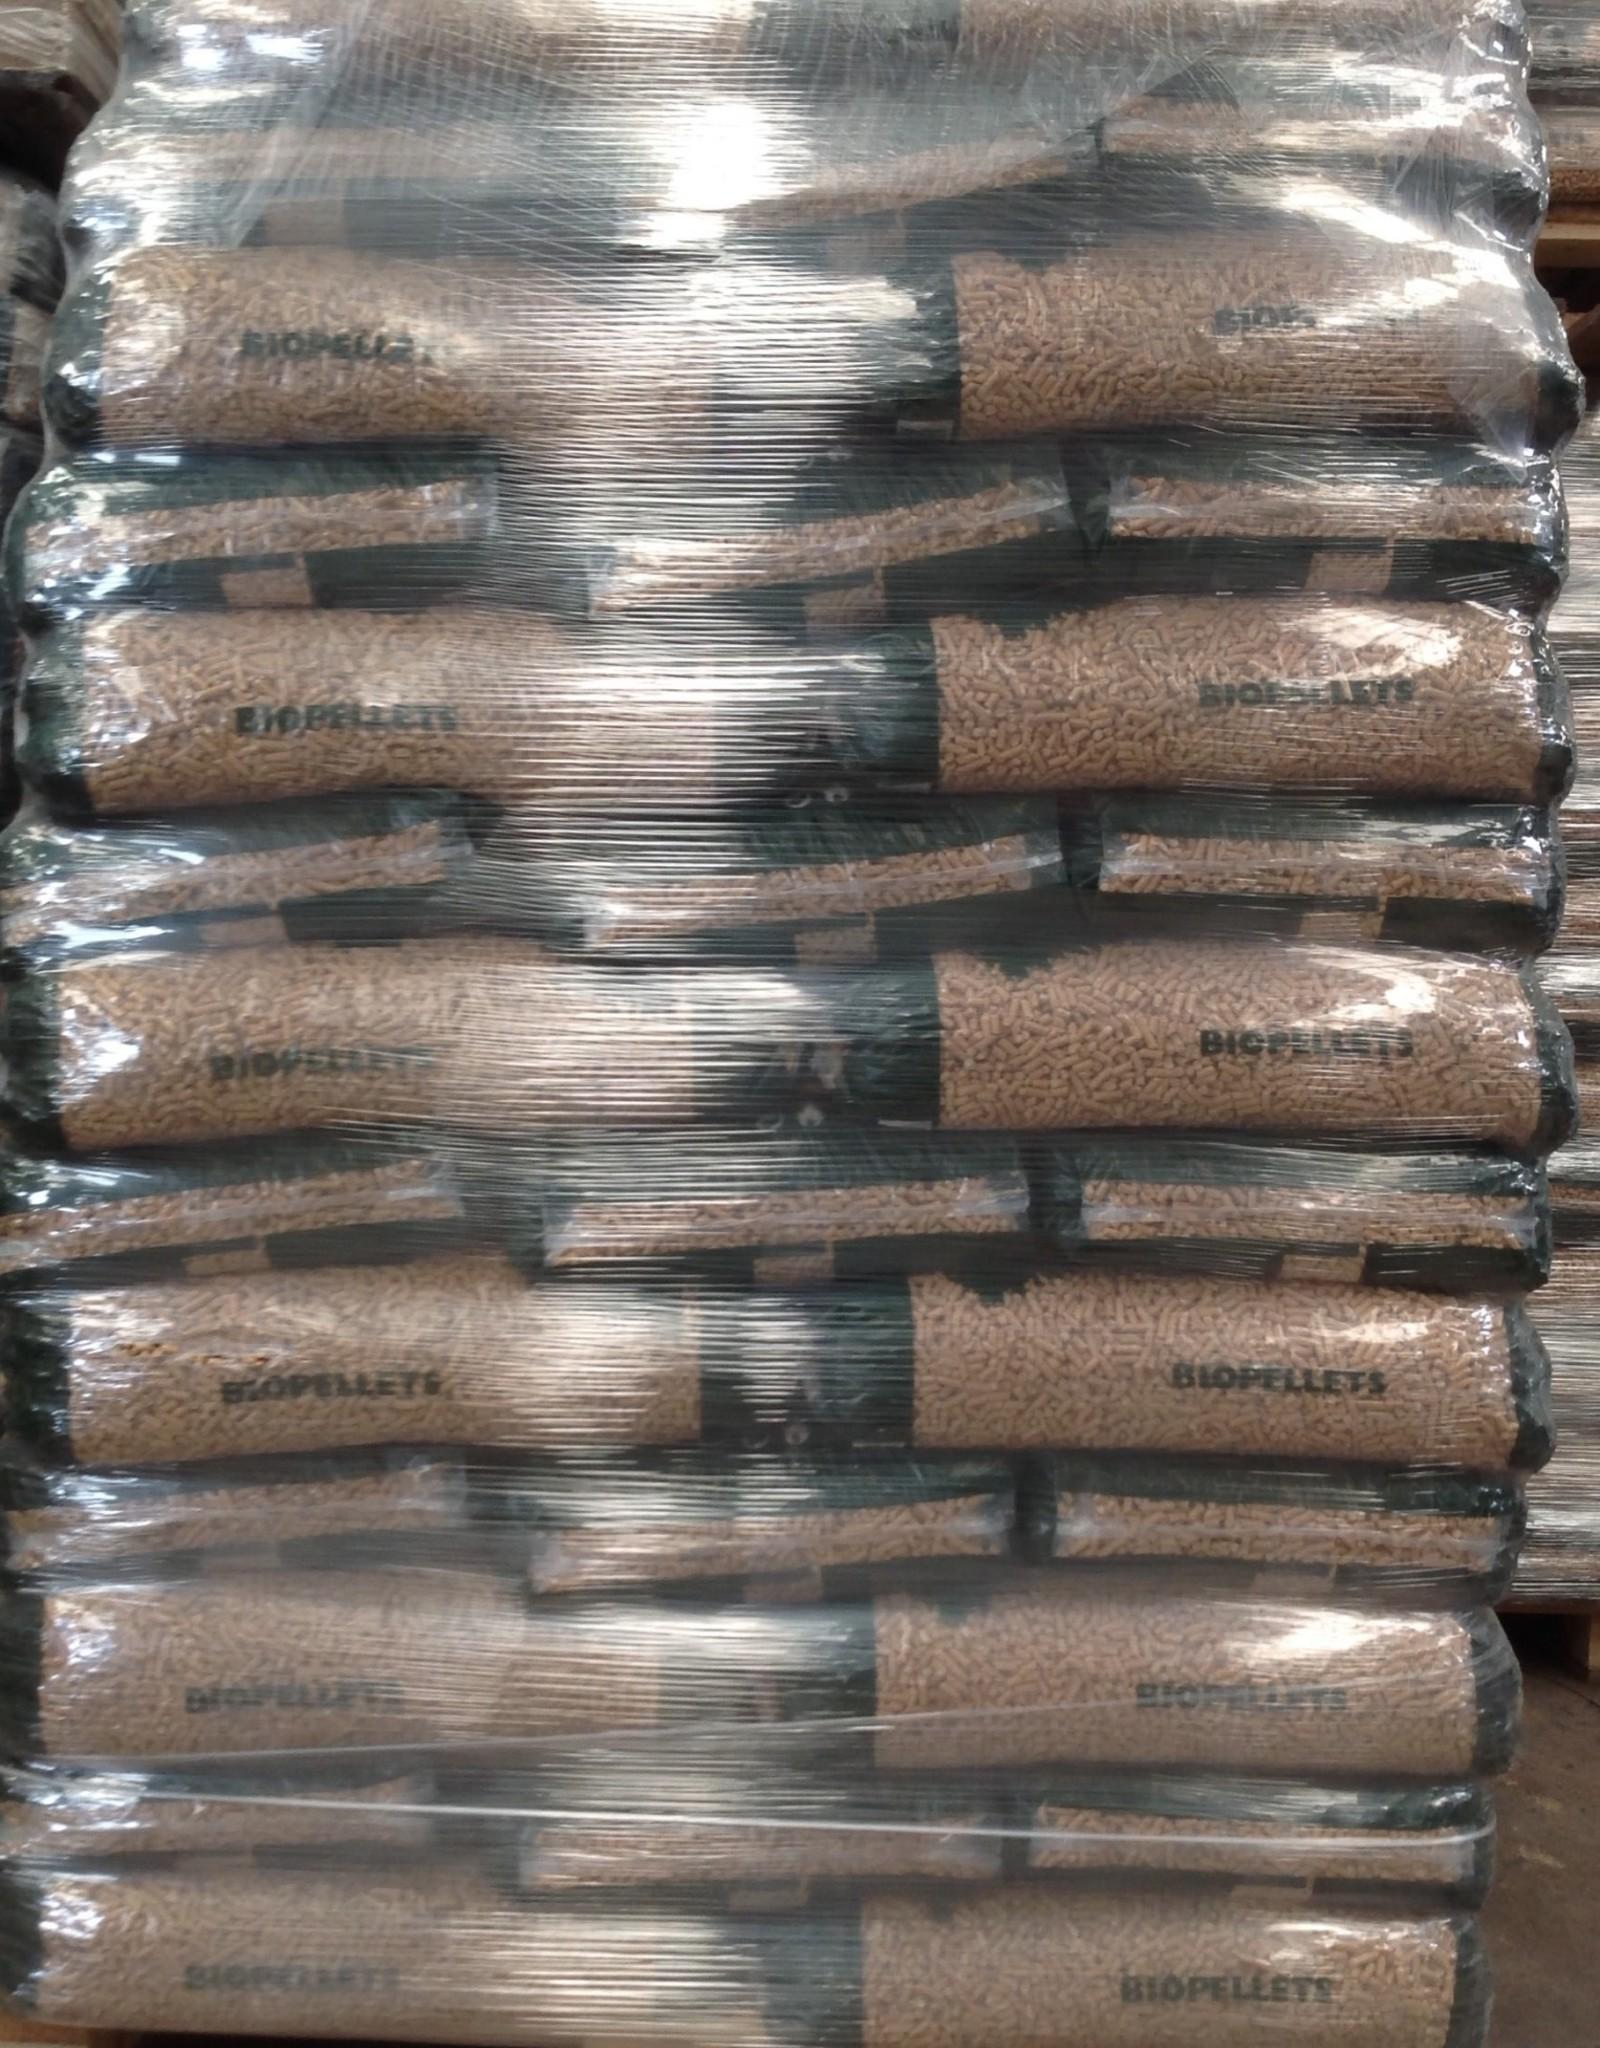 Bio-pellets Pallet BIO-PELLETS  of M & M Mayr - Melnhof Holz  66  zakken  990 kg